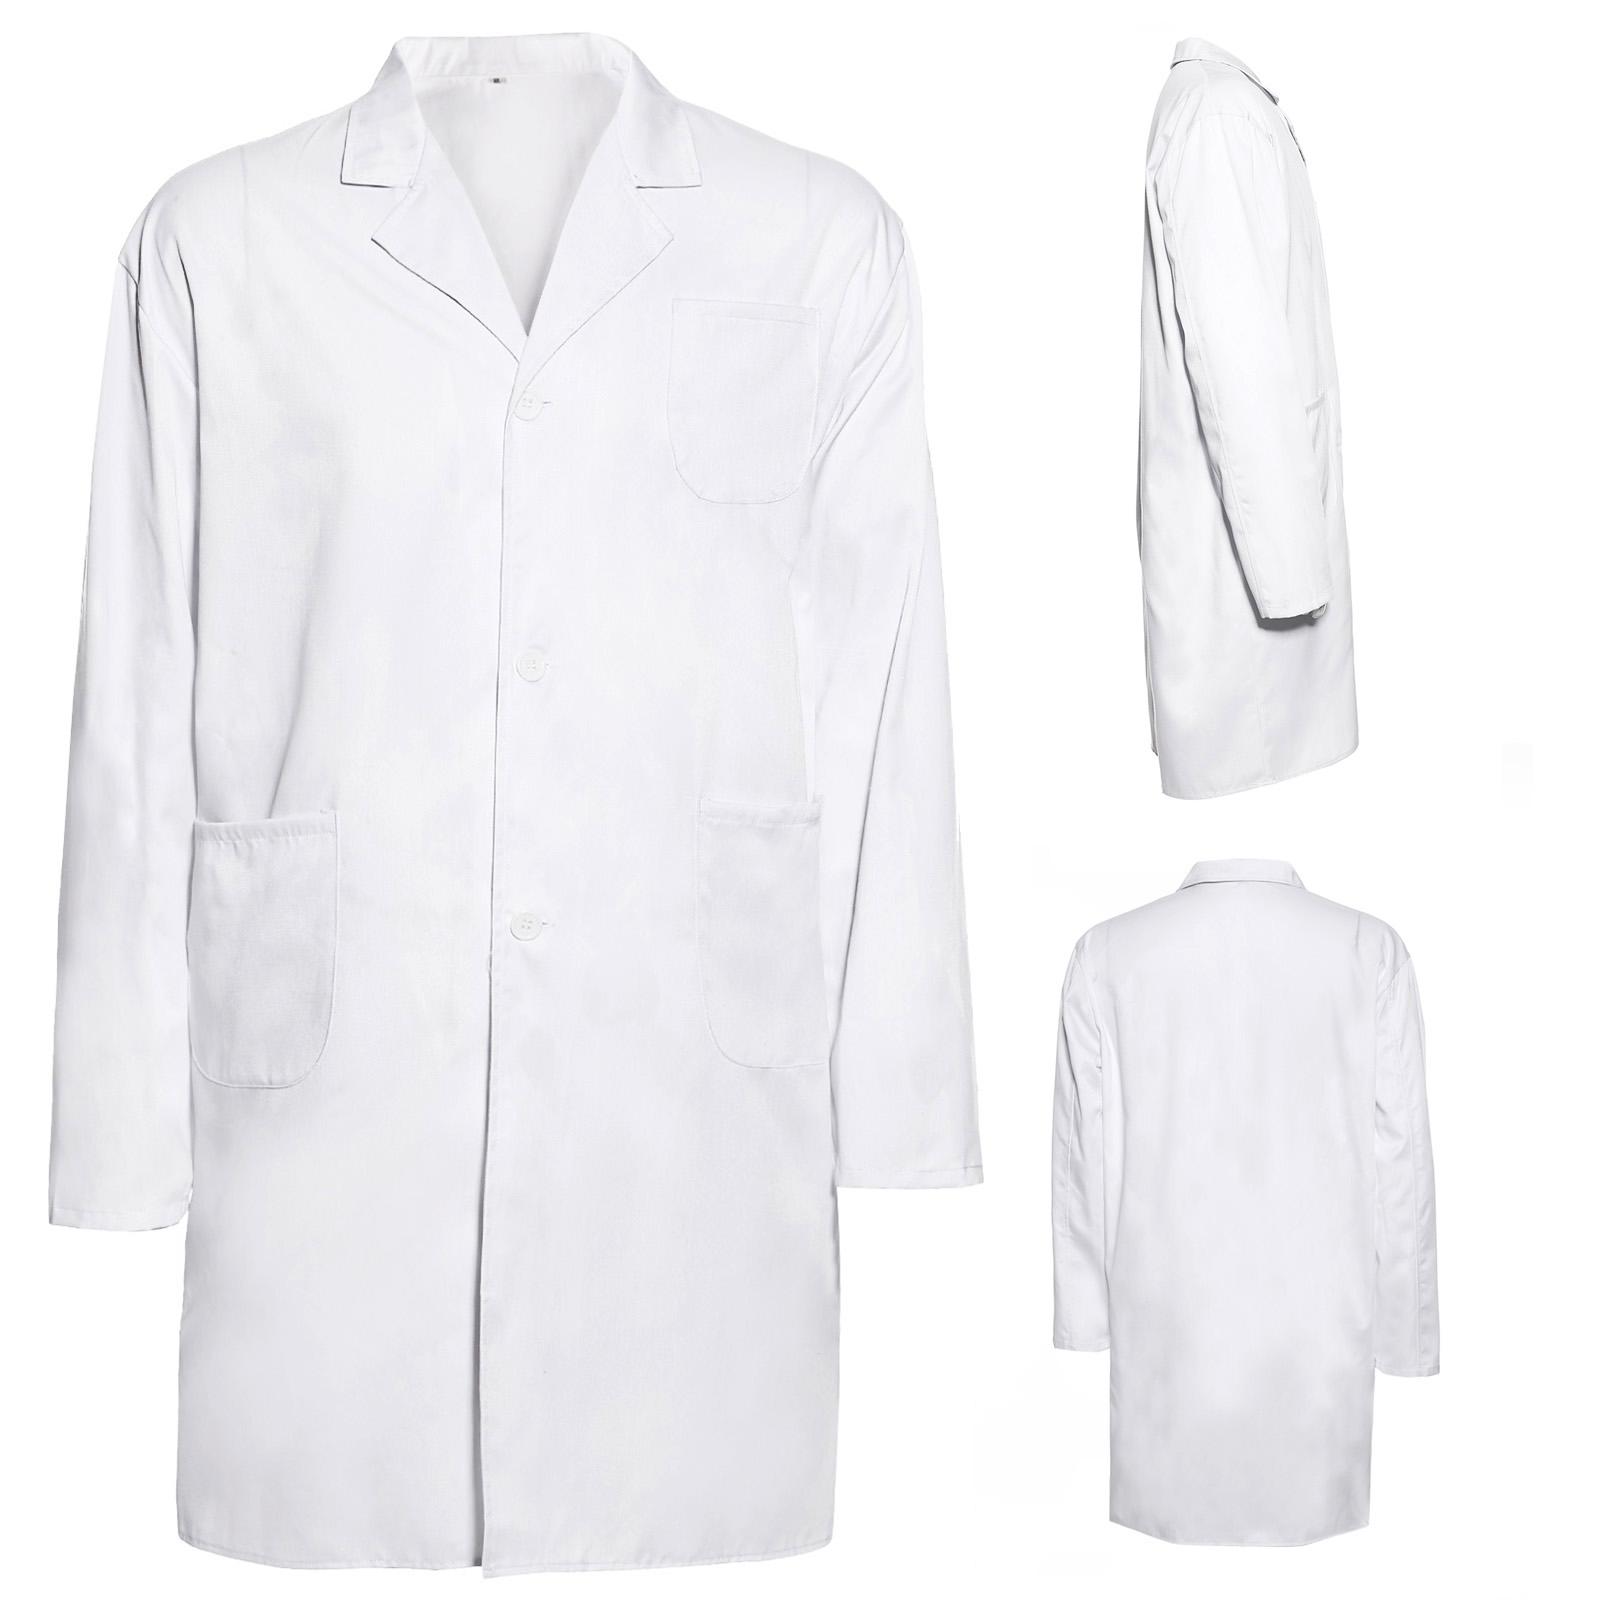 baumwolle laborkittel damen wei labor medizin arzt kittel mantel visitenmantel ebay. Black Bedroom Furniture Sets. Home Design Ideas